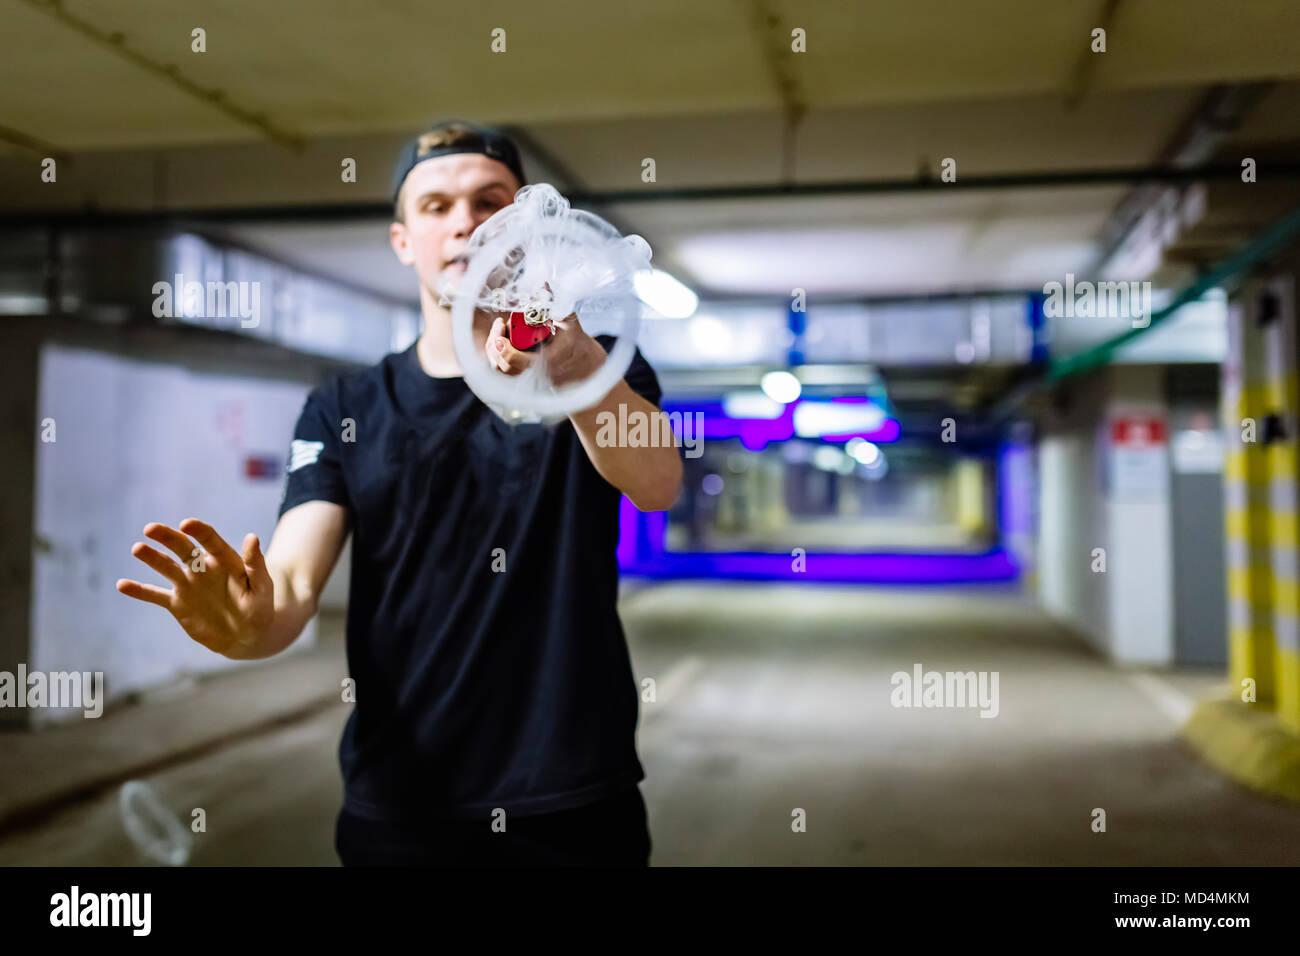 Man in cap smoke an electronic cigarette performing various kind of vaping tricks - Stock Image